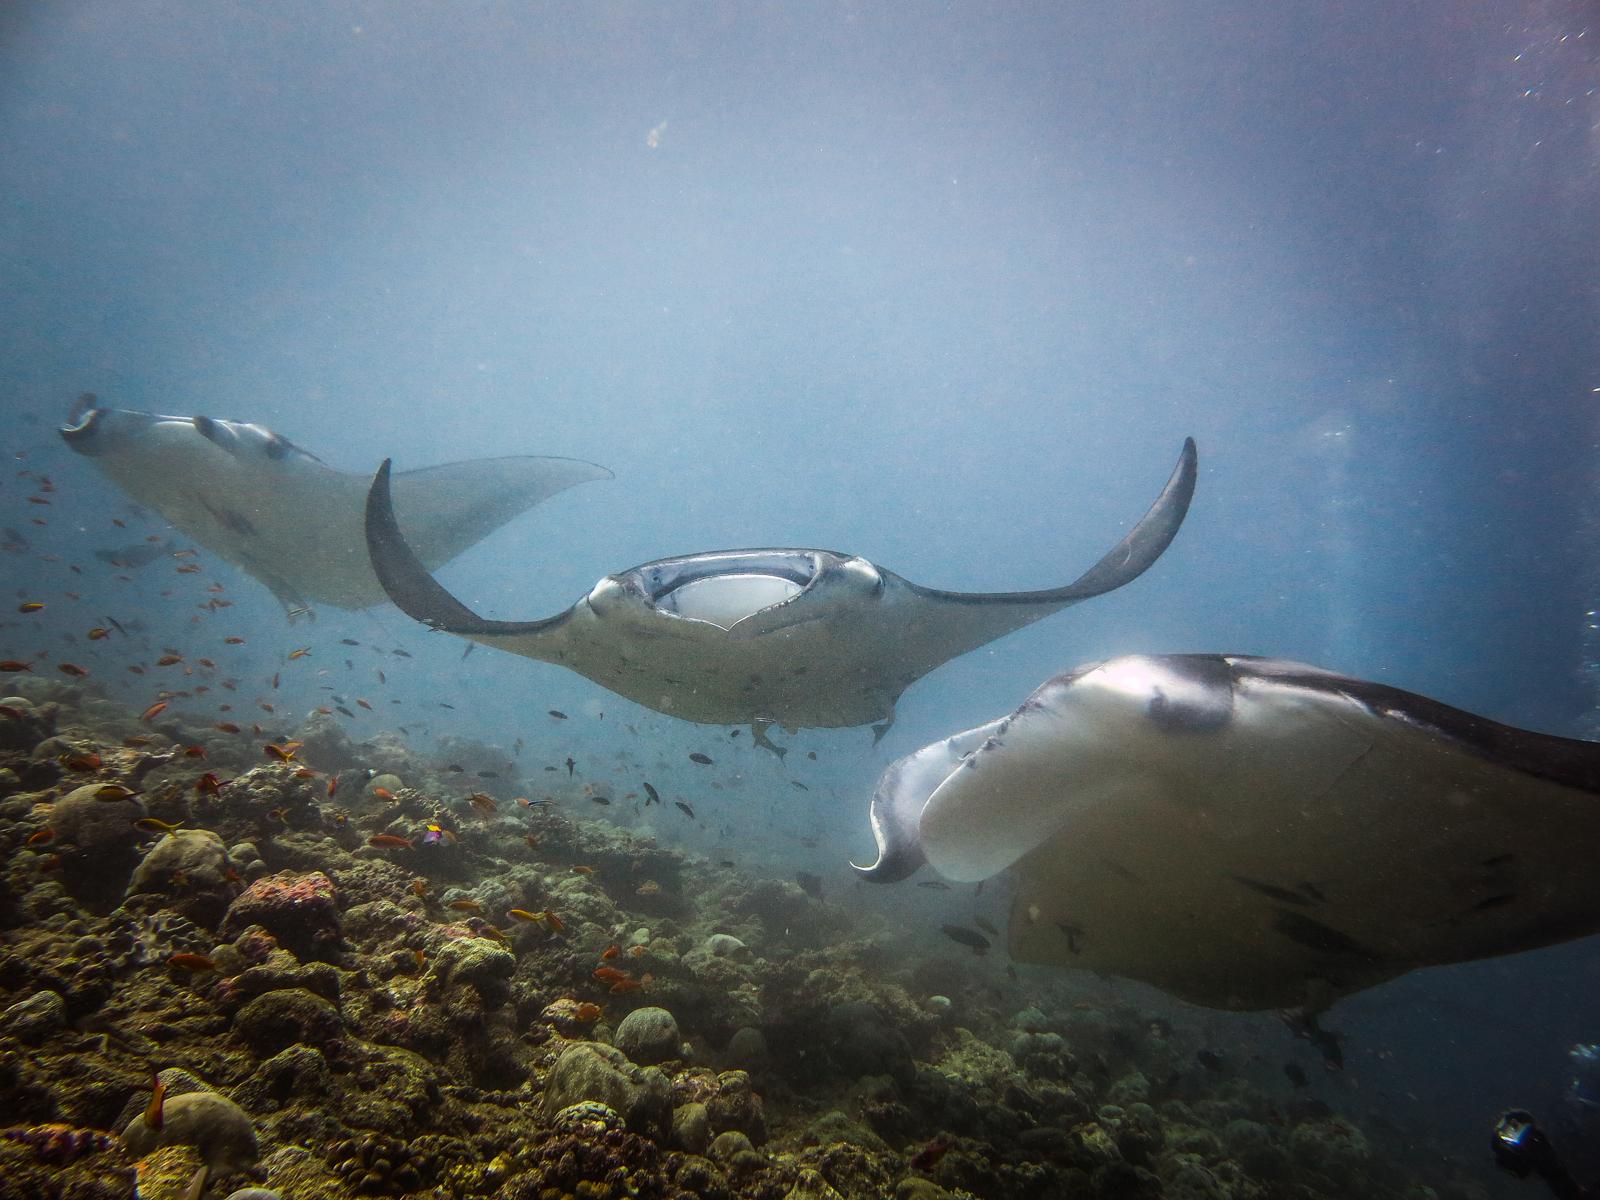 malediven 2014 (7 of 14)